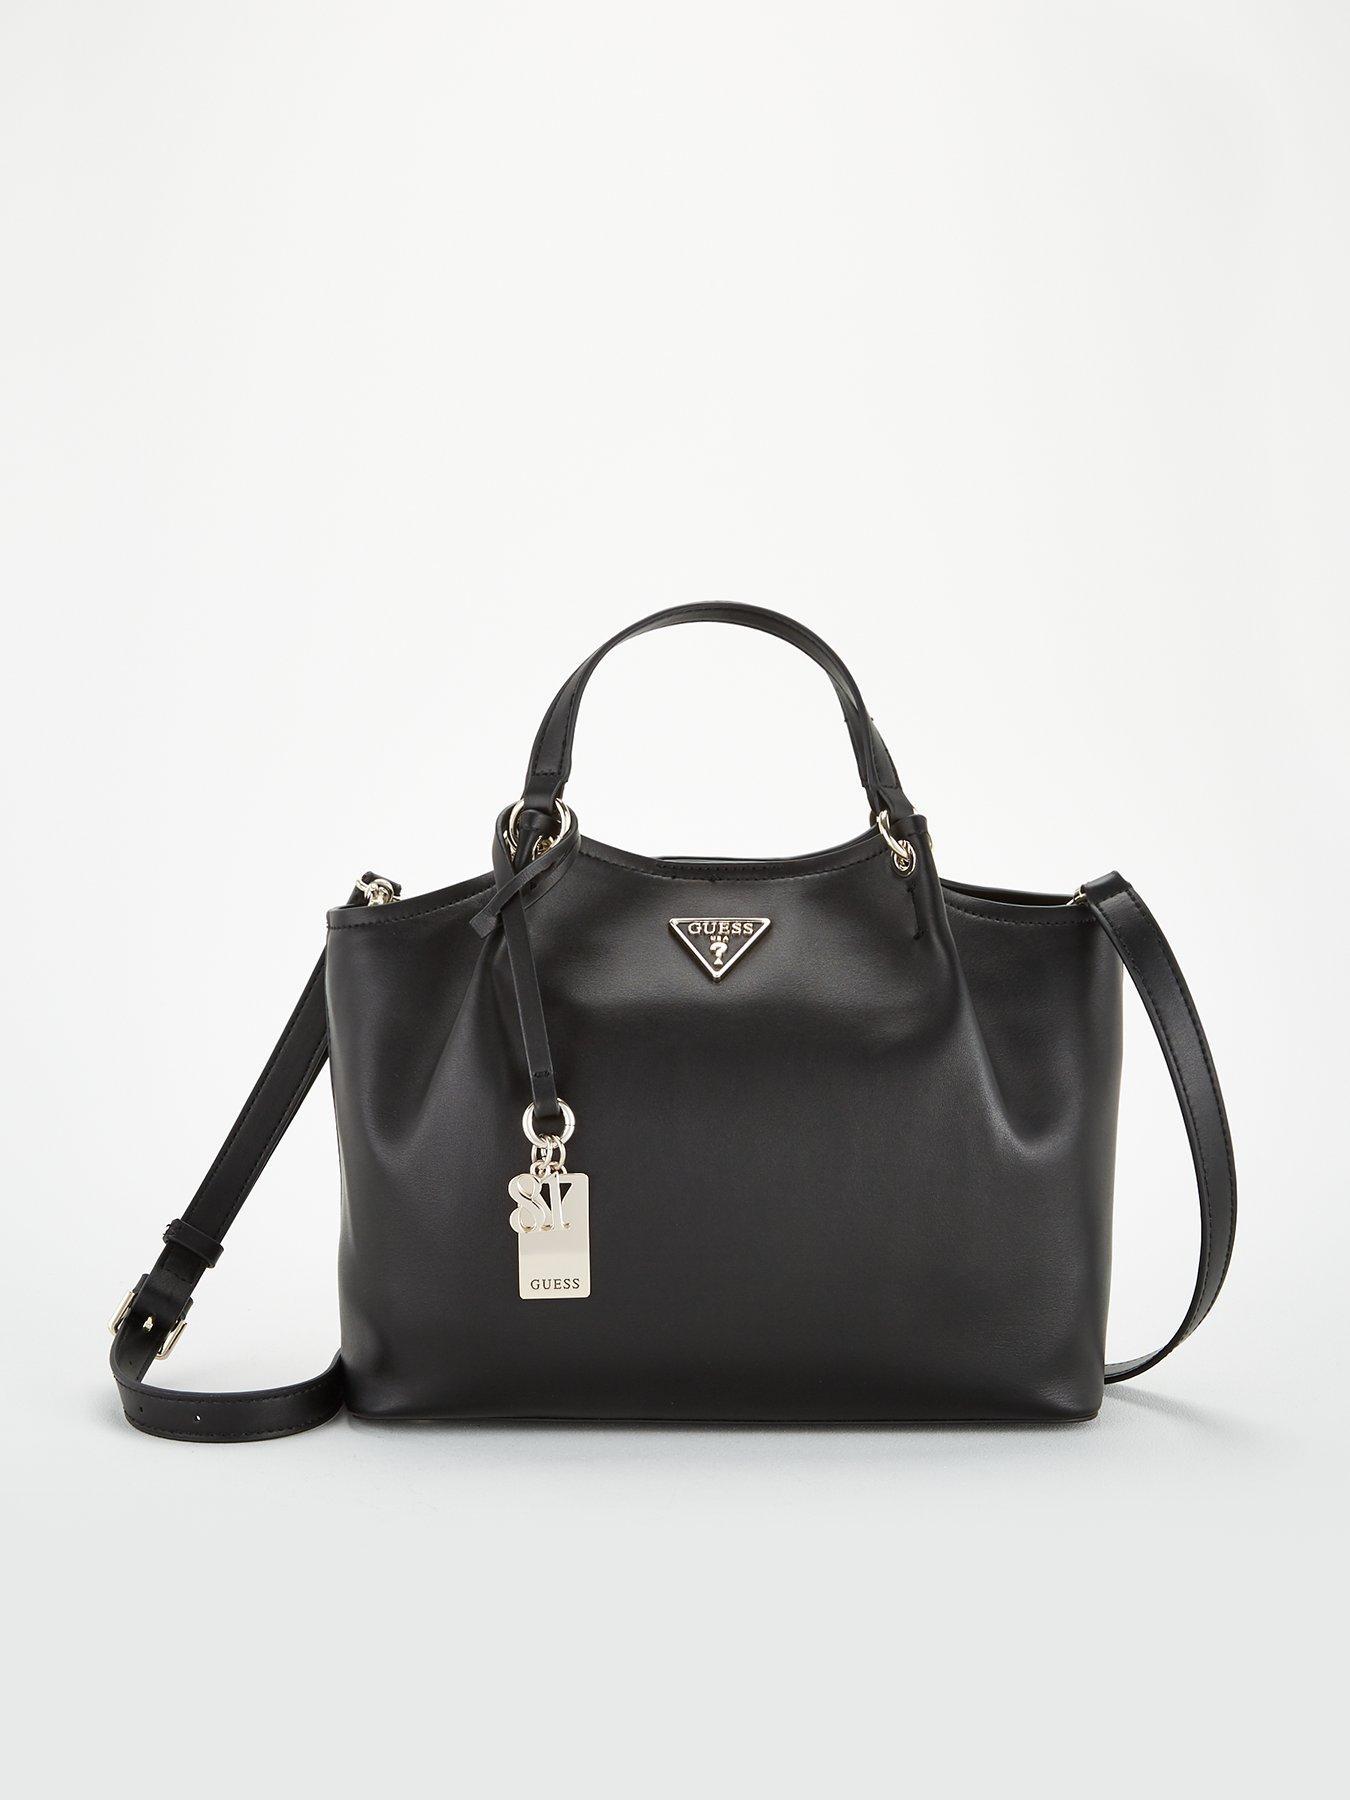 Satchels Handbags for Women Beautiful Cute Flamingo Multi-Functional Woman Ladies Bag Fit for 15 Inch Computer Notebook MacBook